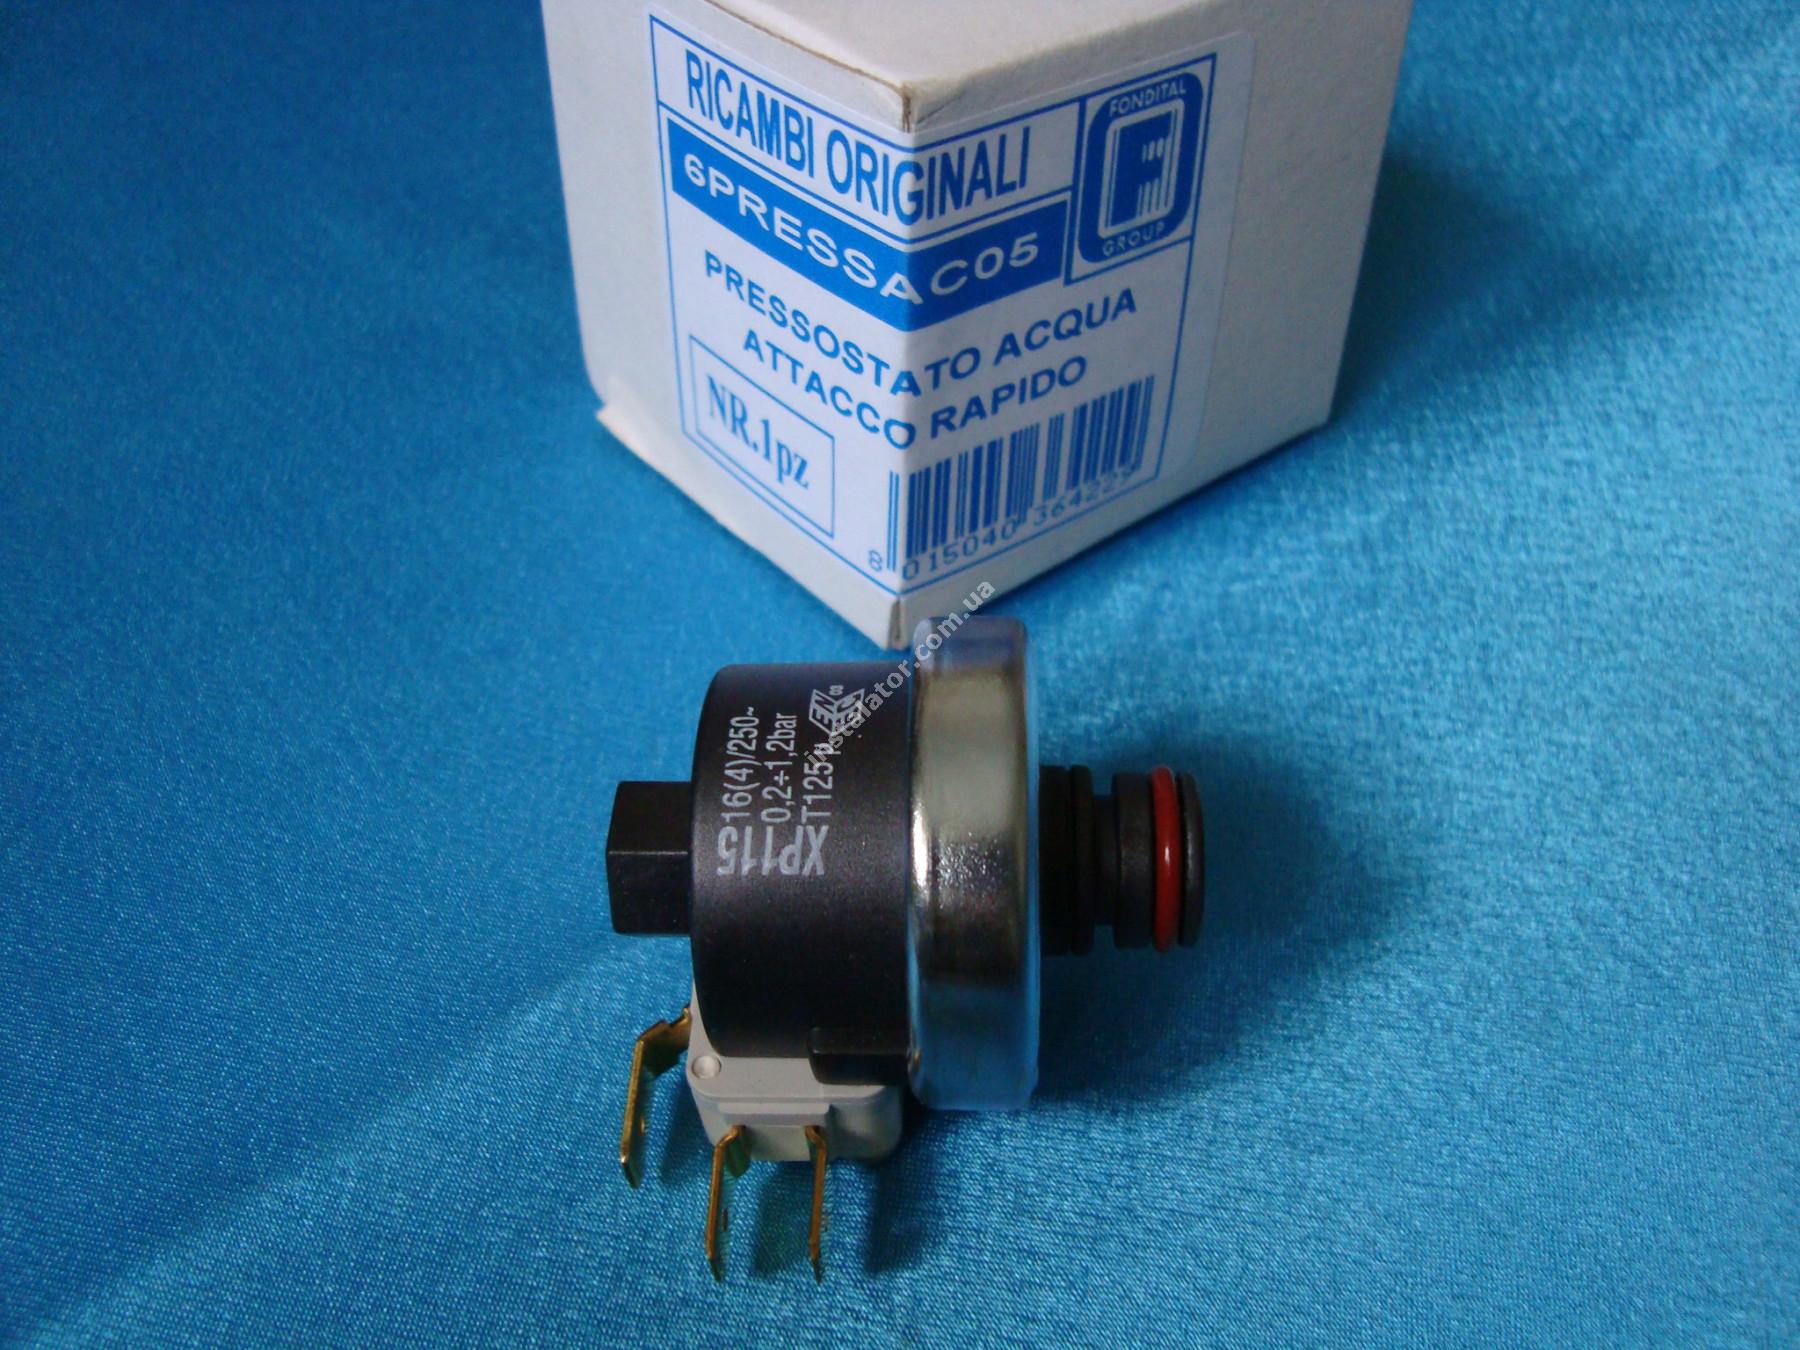 6PRESSAC01 Реле давления воды Vela Compact 0,2-1,2 бар full-image-4